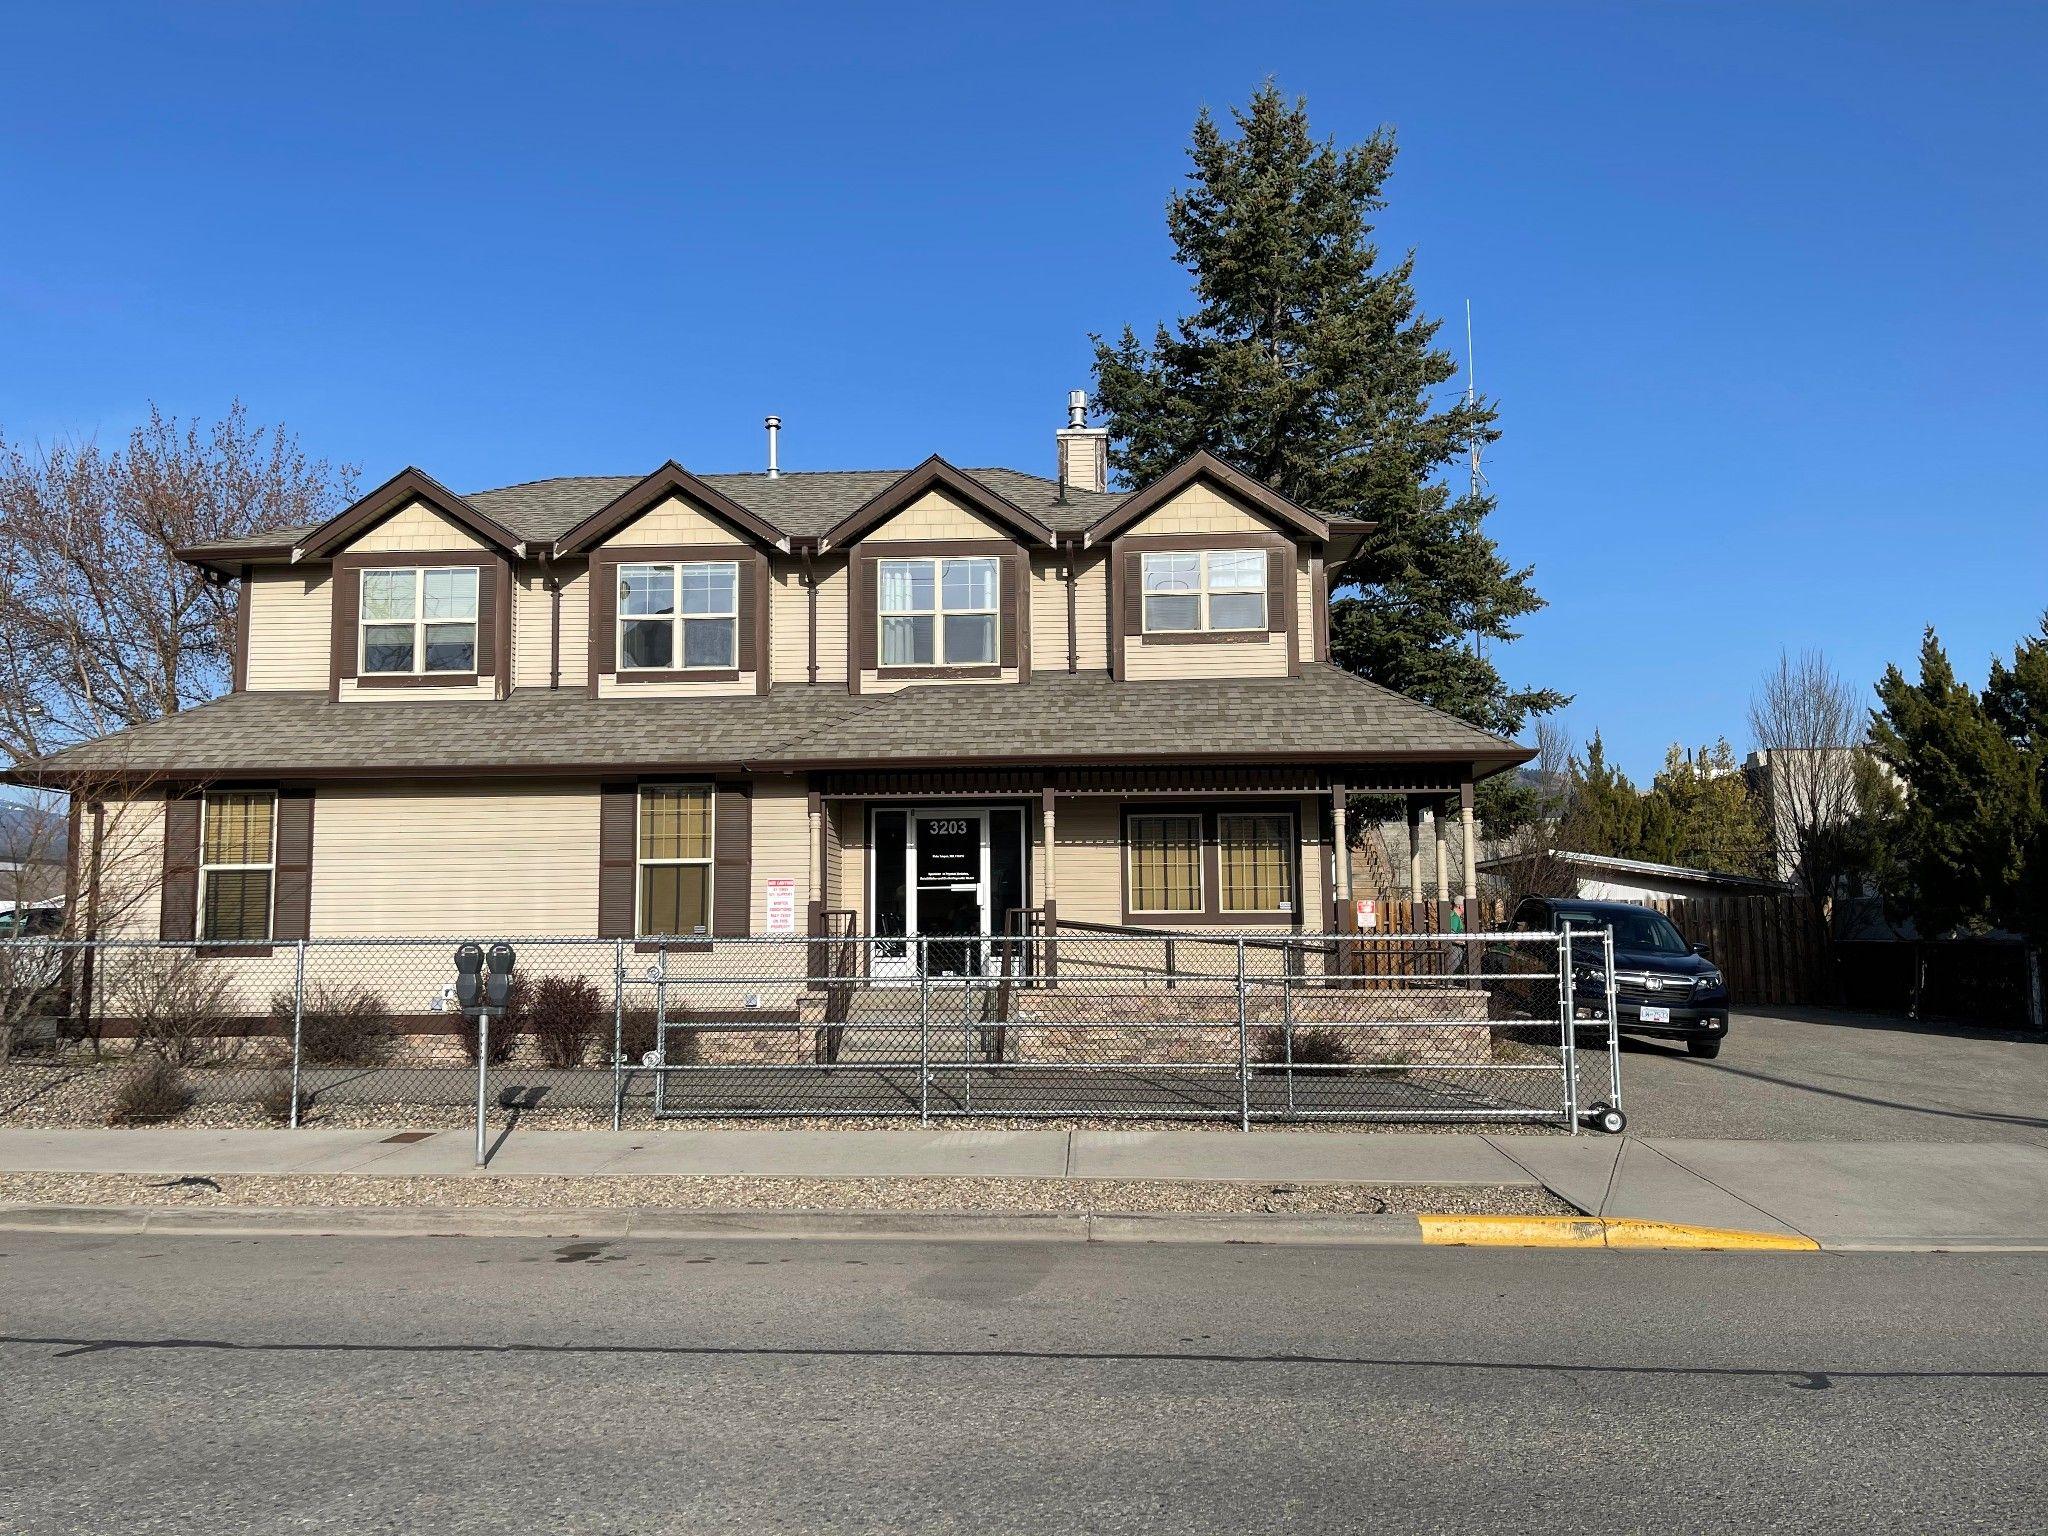 Main Photo: 3203 34th Street in Vernon: City of Vernon Office for sale (North Okanagan)  : MLS®# 10229309